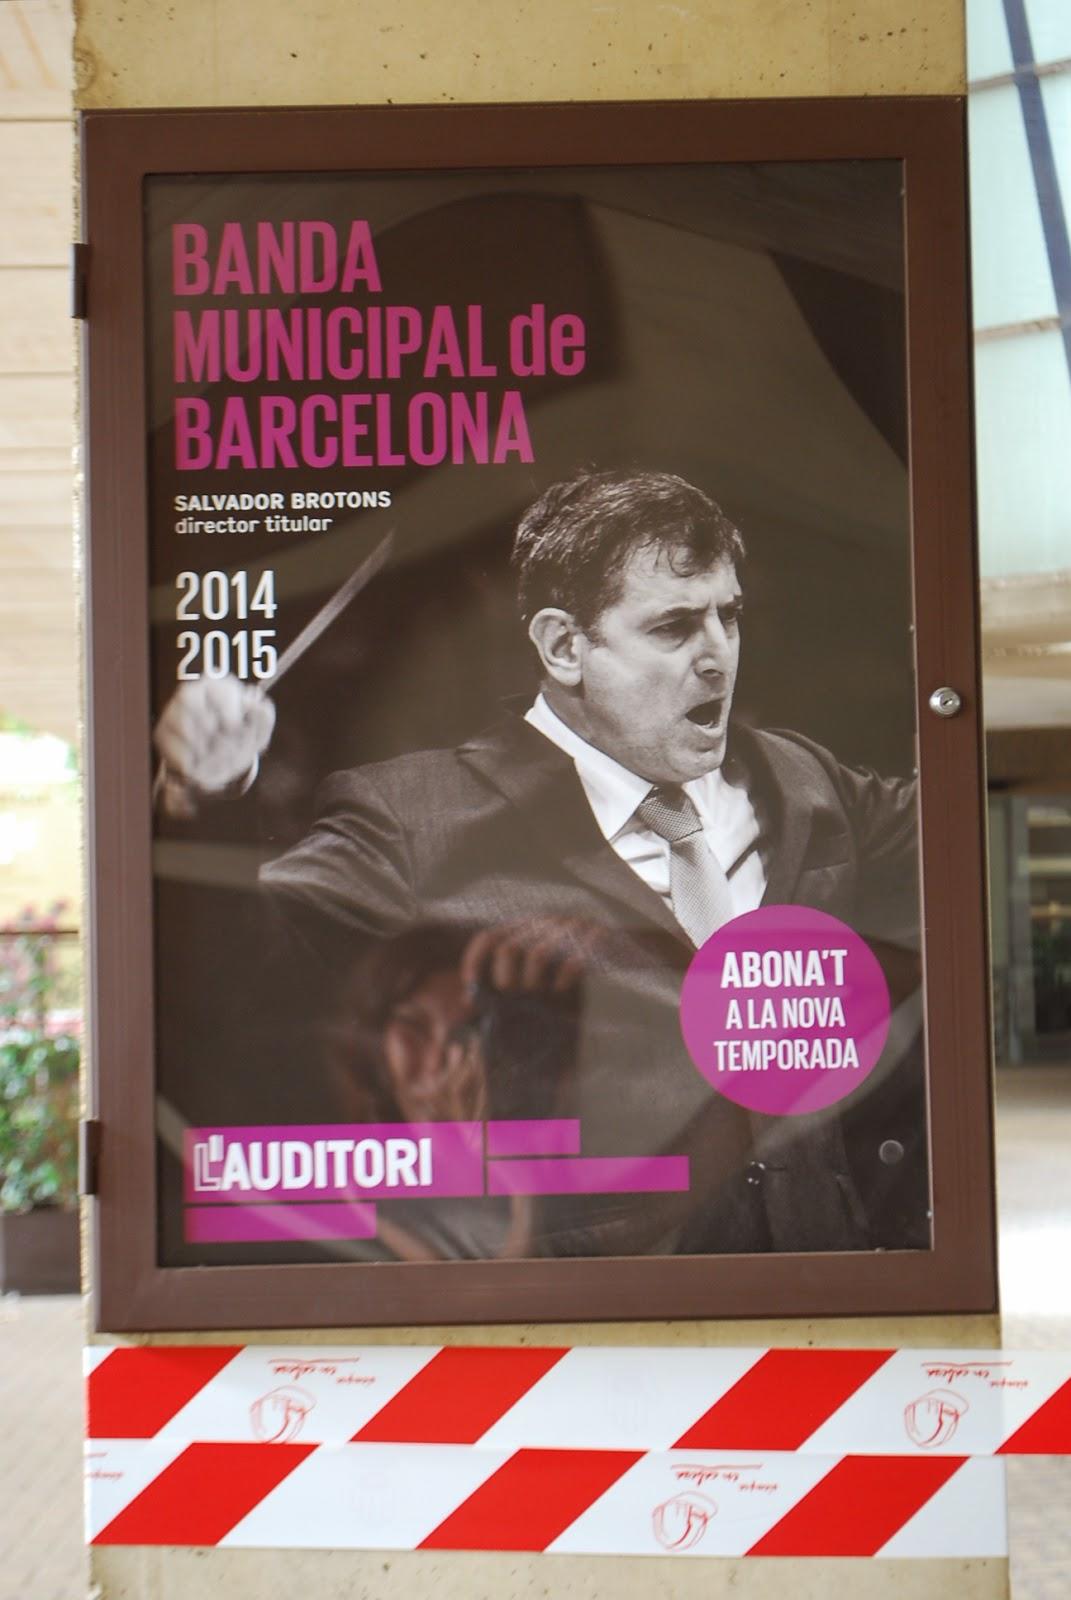 Барселонаская банда:), Каталония, Испания. Barcelona, Catalonia, Spain